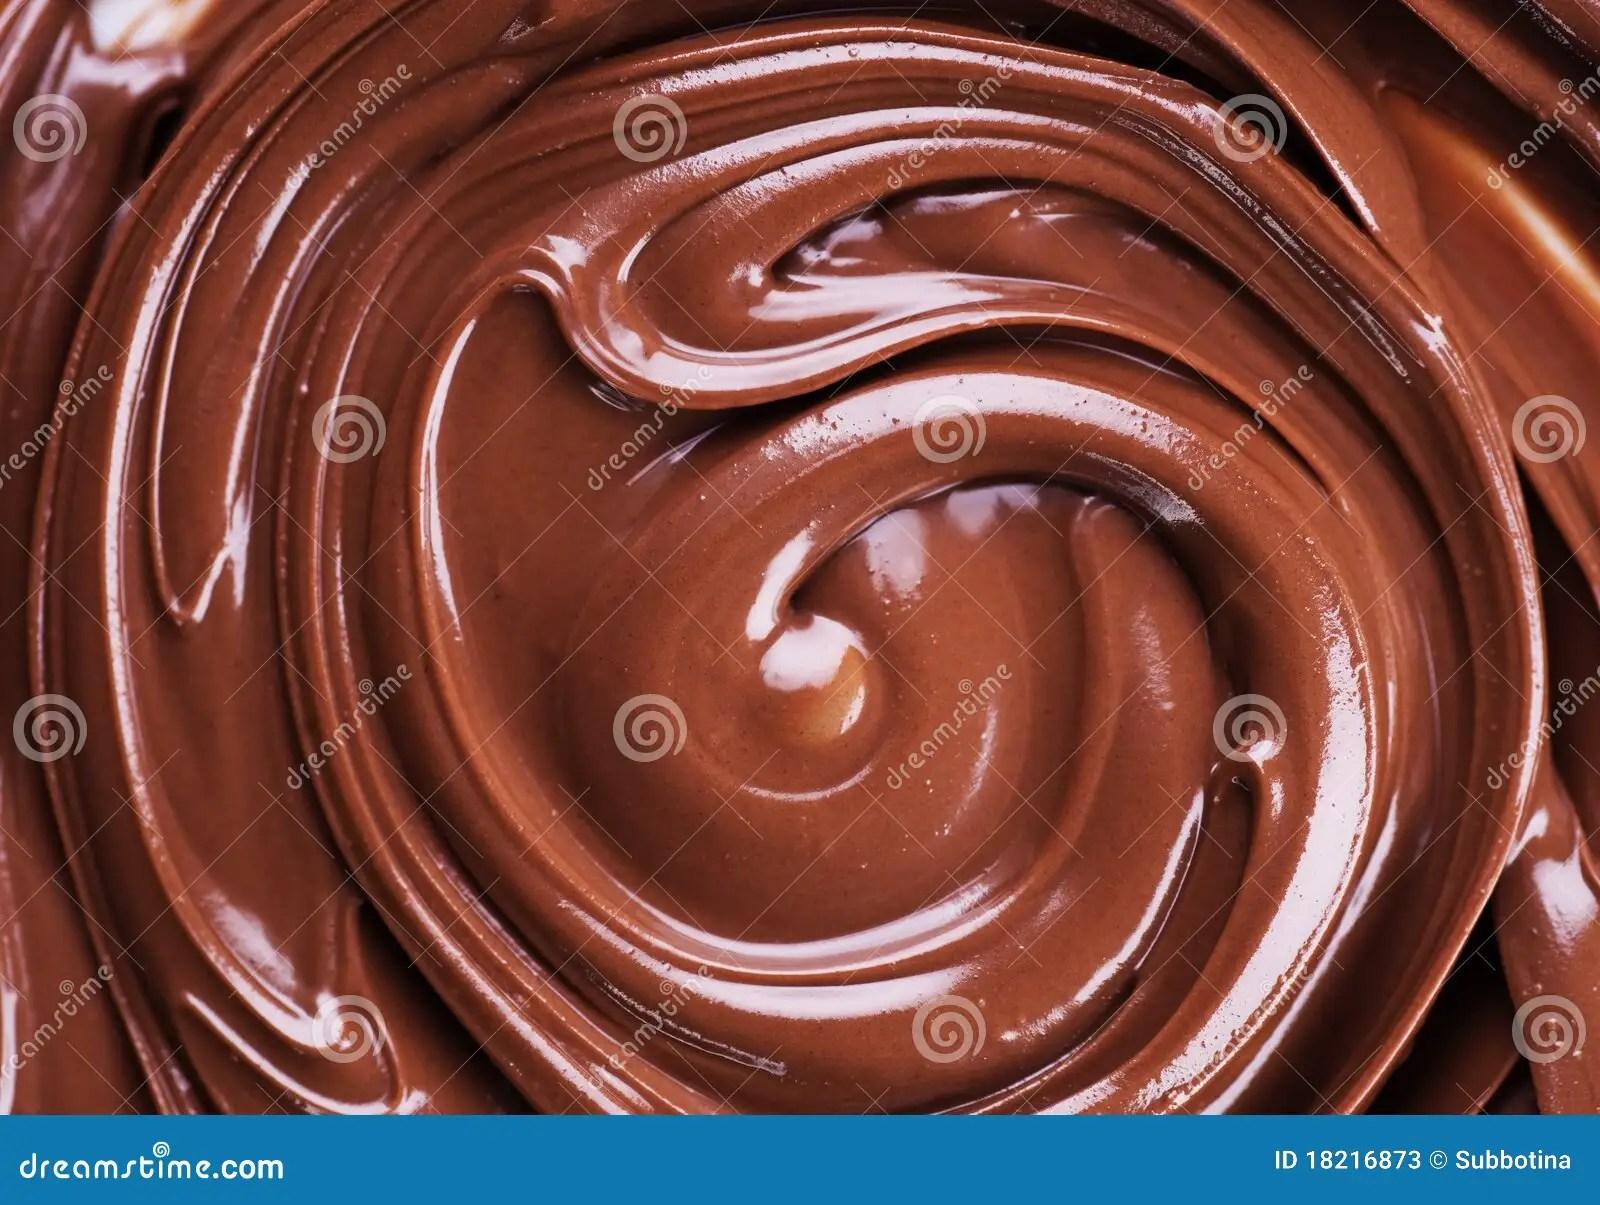 Black Textured Wallpaper Chocolate Swirl Stock Photos Image 18216873